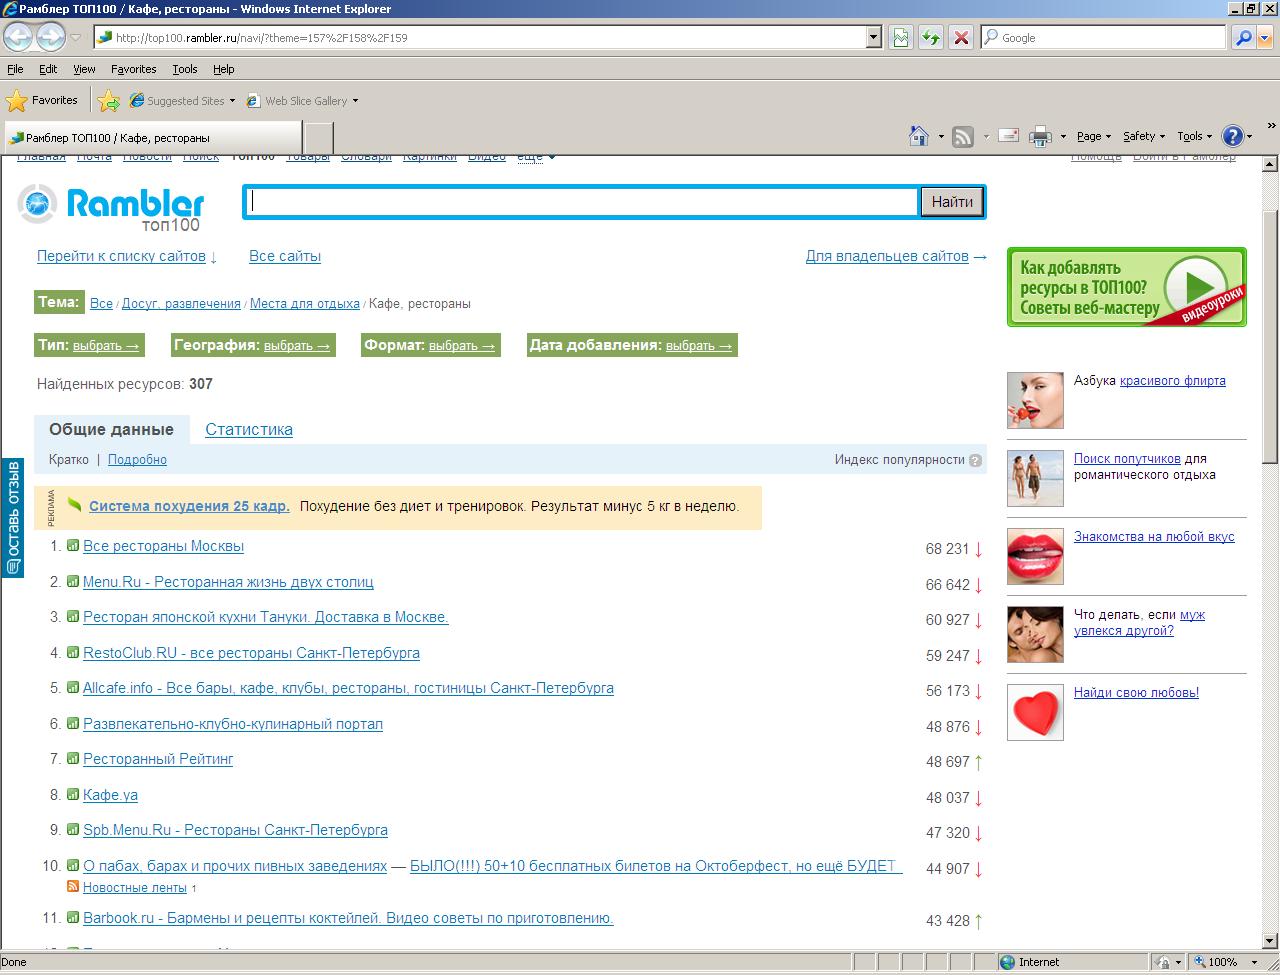 BeerPlace.com.ua - в рейтинге Rambler TOP100